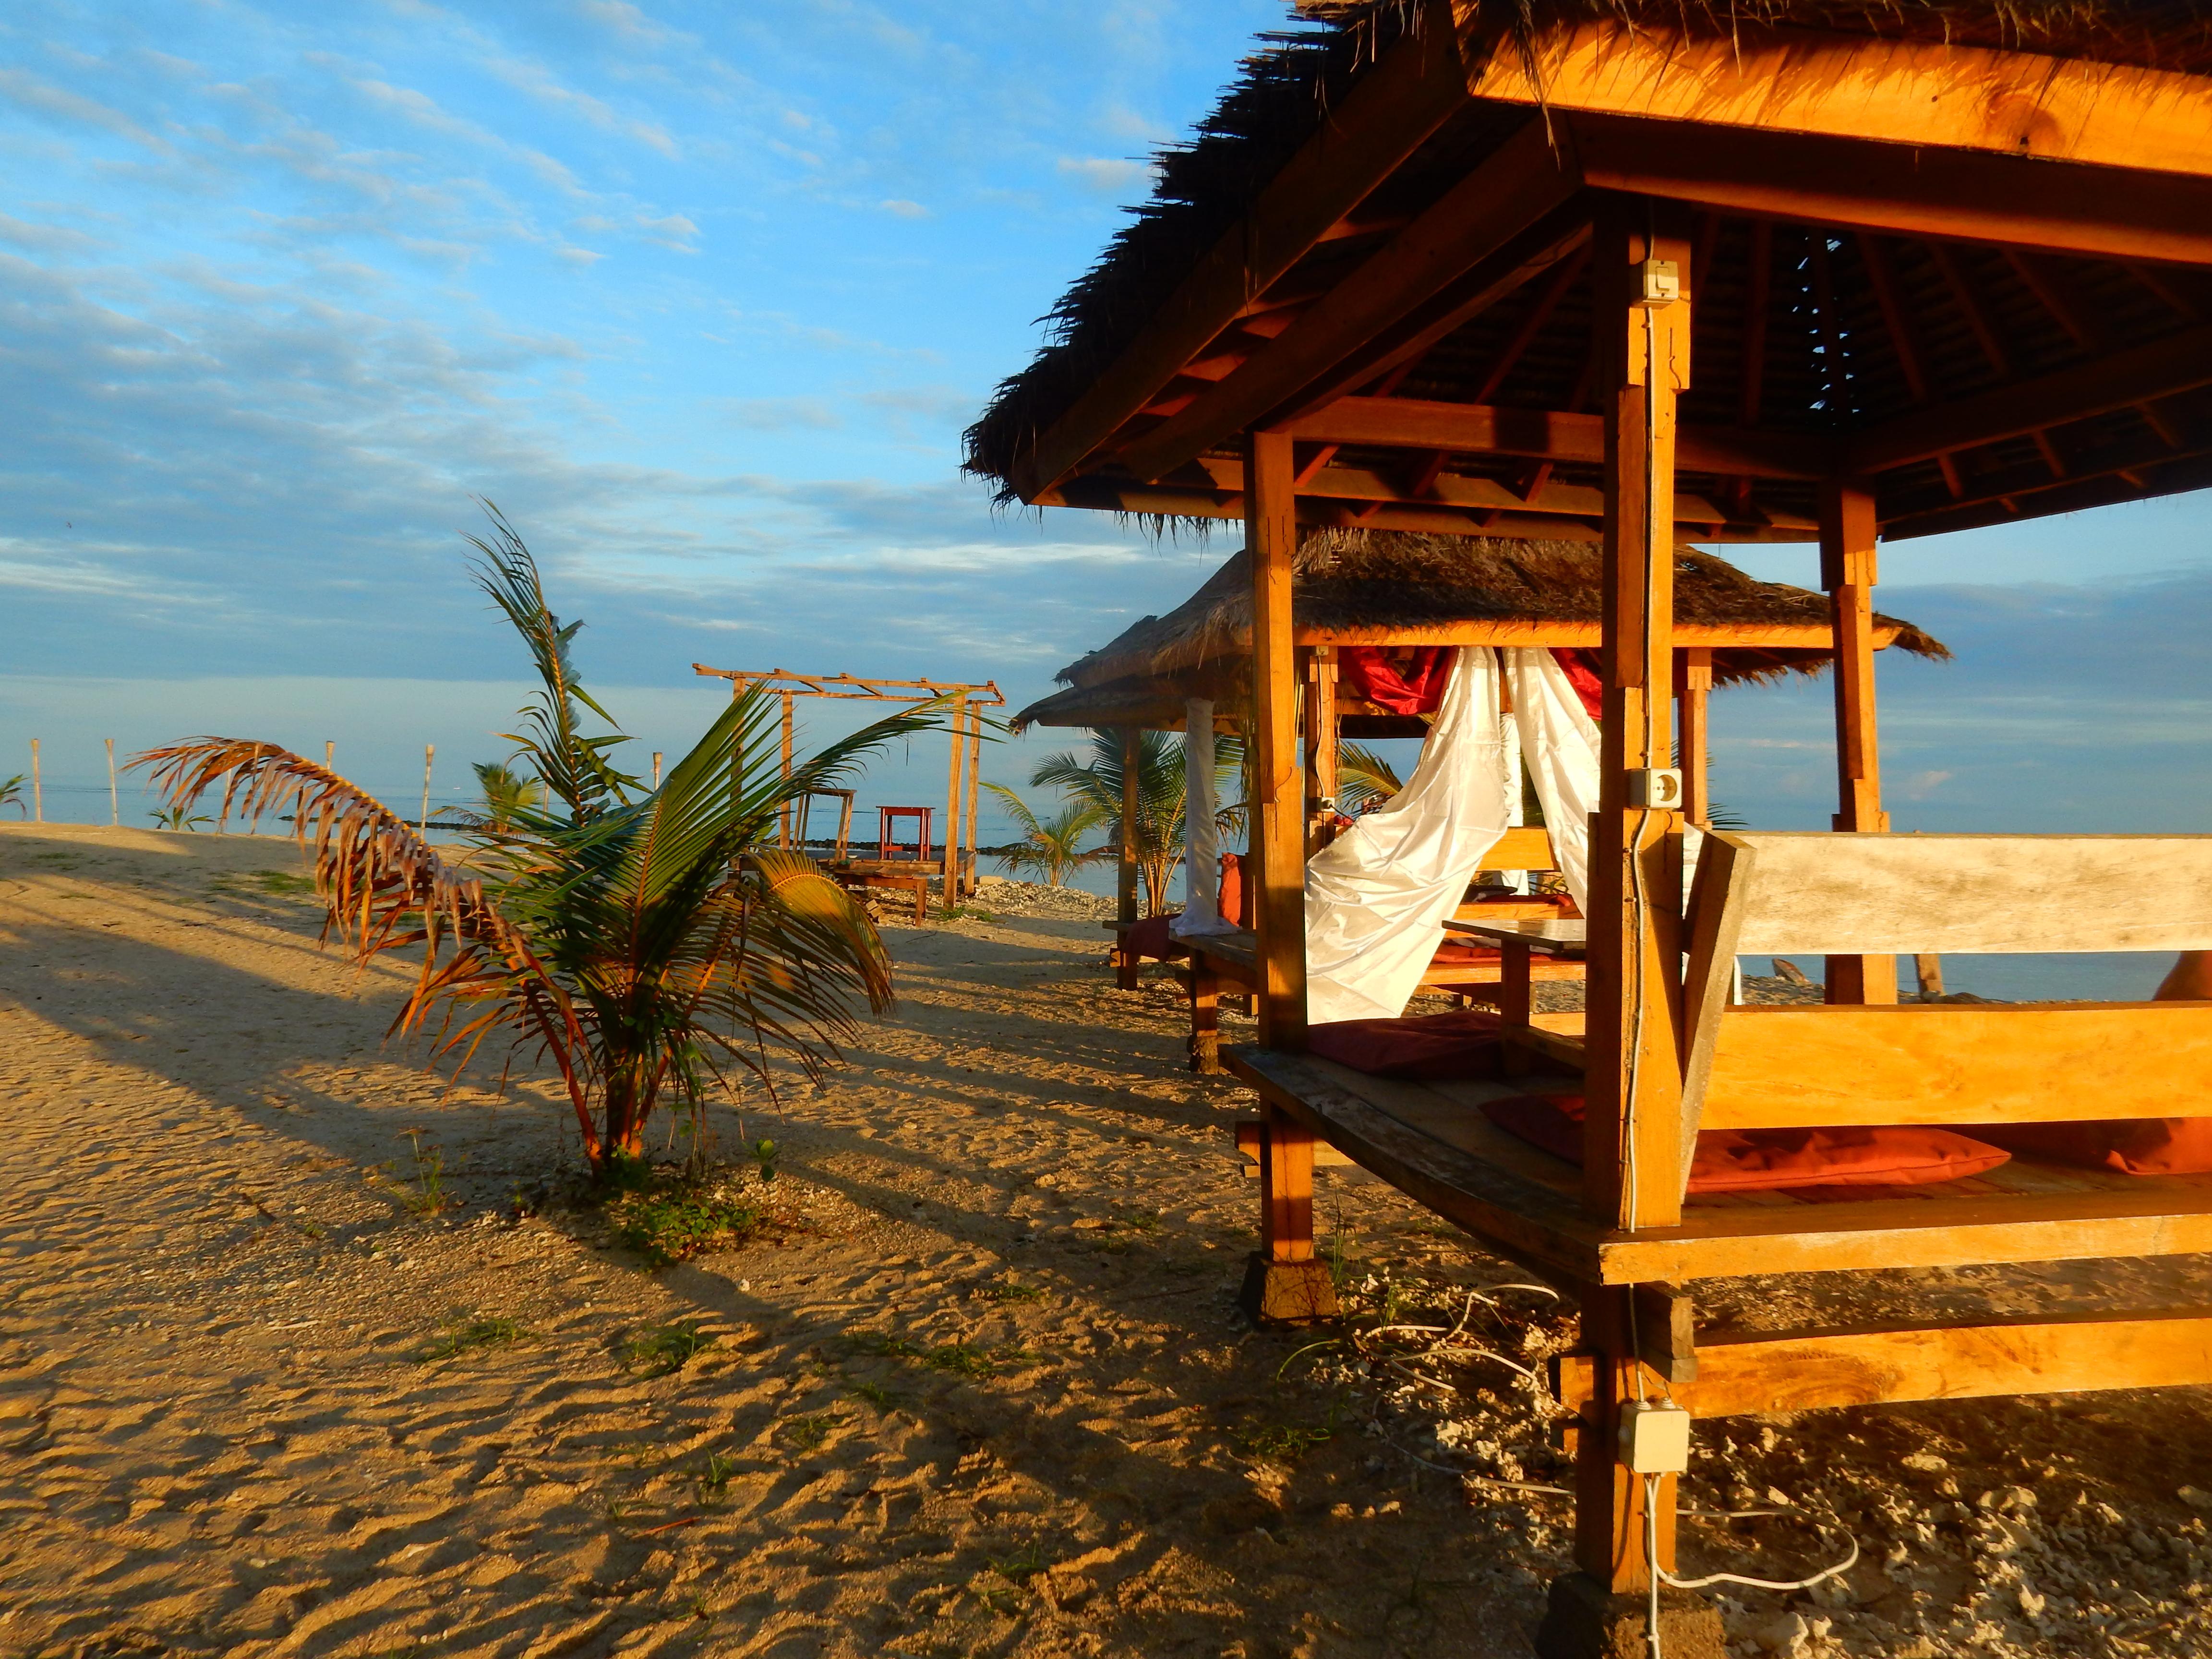 Lever de soleil, Sunrise, Hutte Gili Air, Indonésie